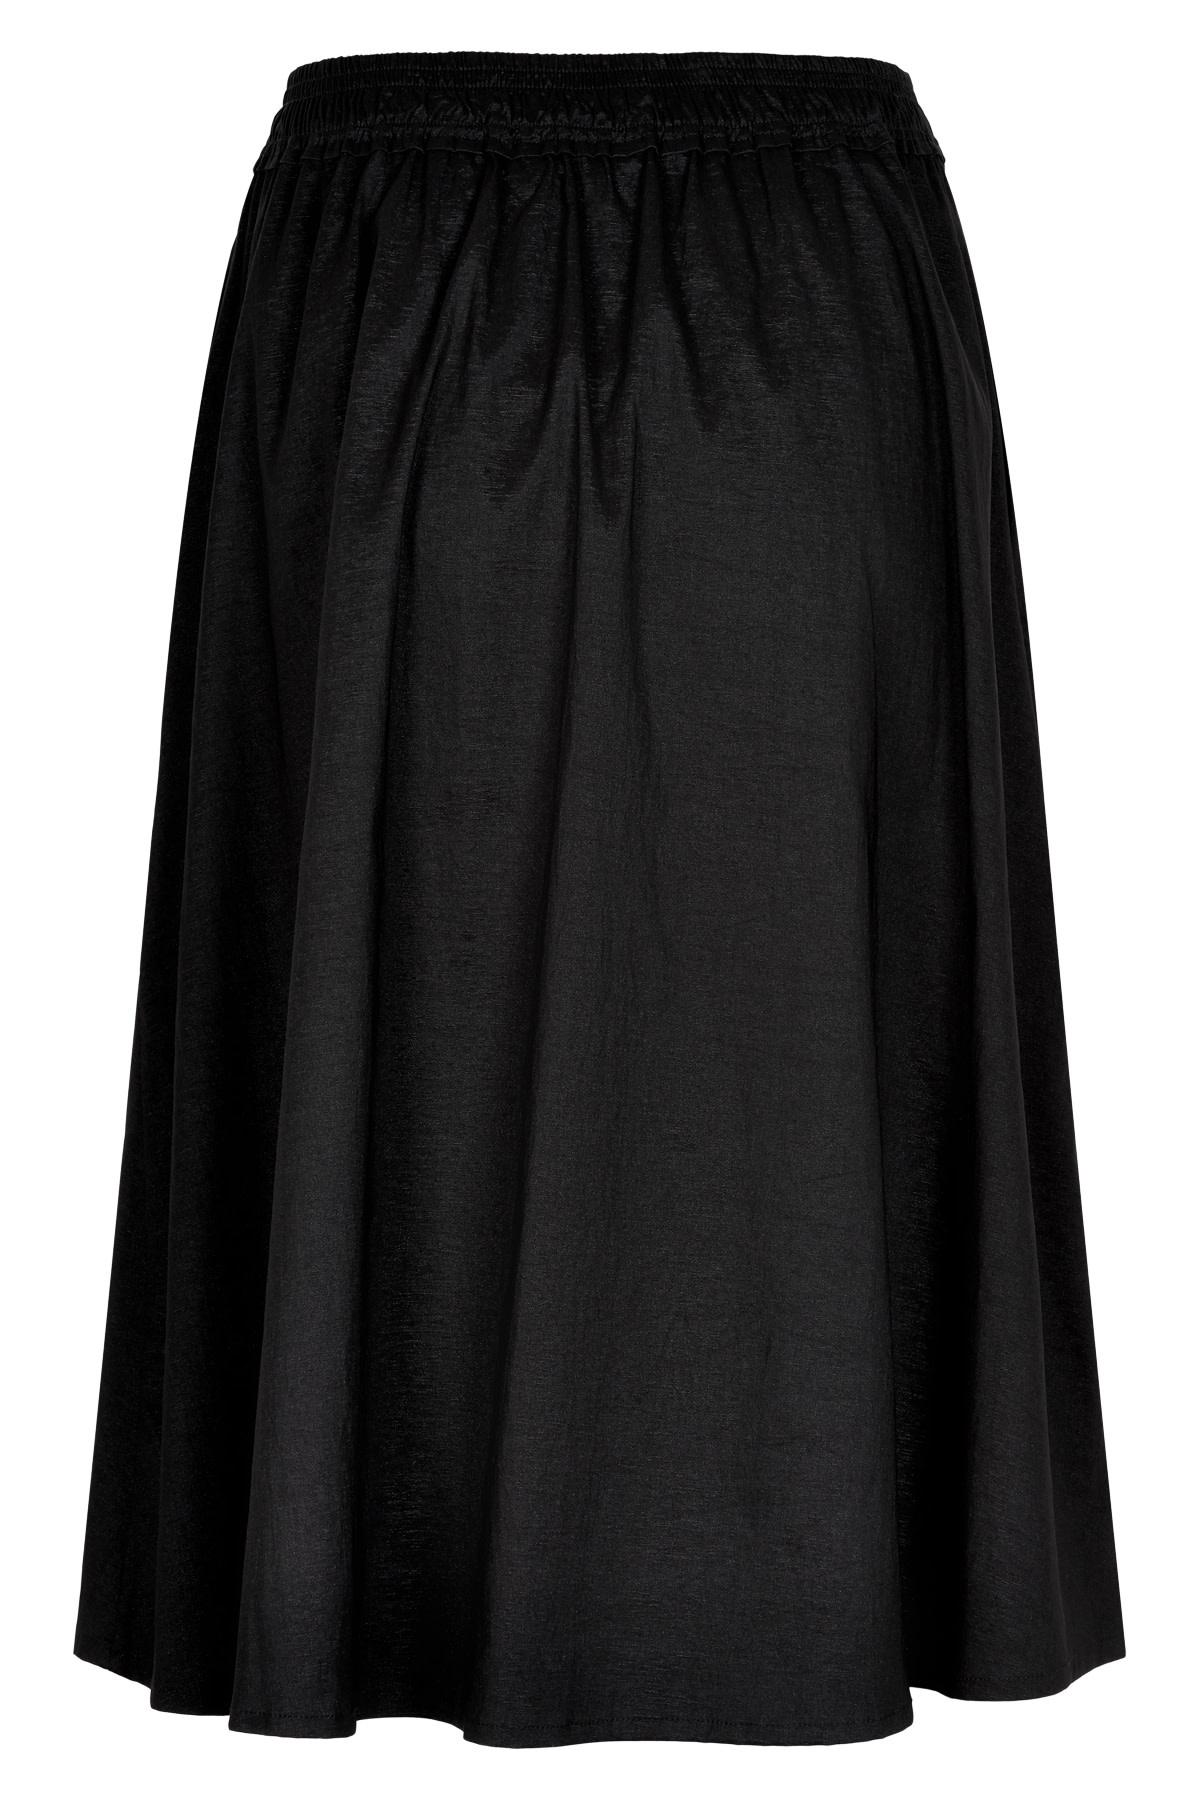 AndLess Hansine Skirt - Zwart